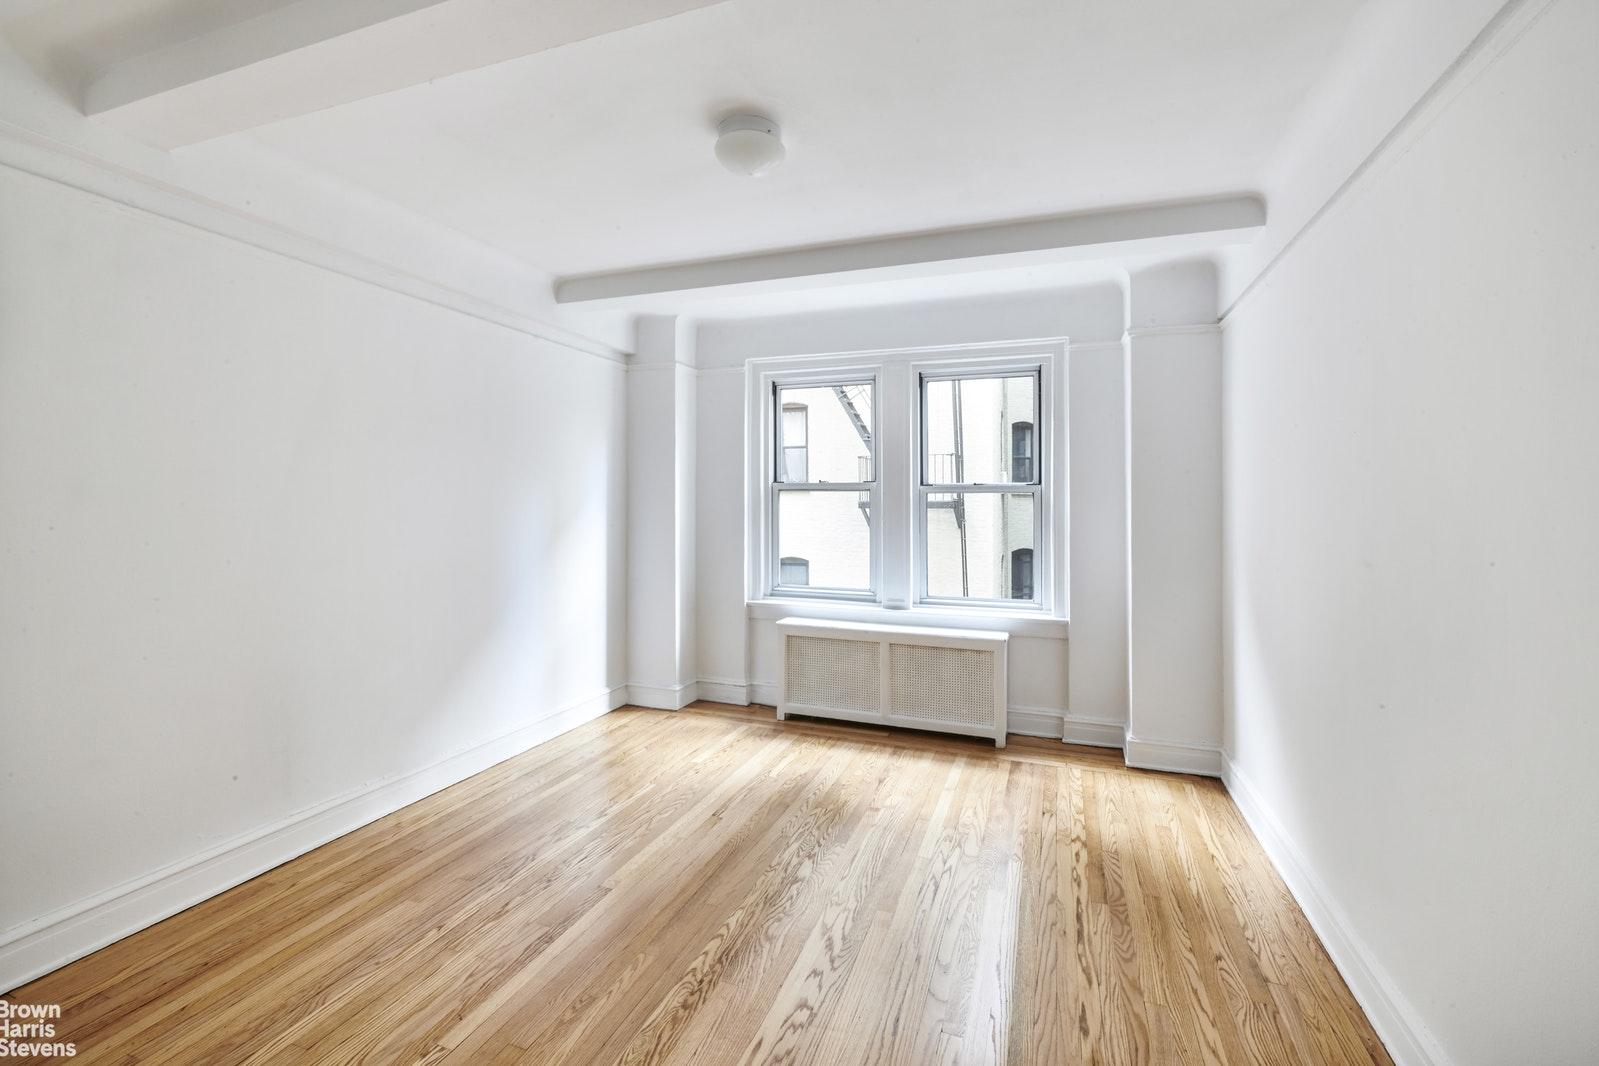 163 EAST 81ST STREET 2C, Upper East Side, $750,000, Web #: 20017110